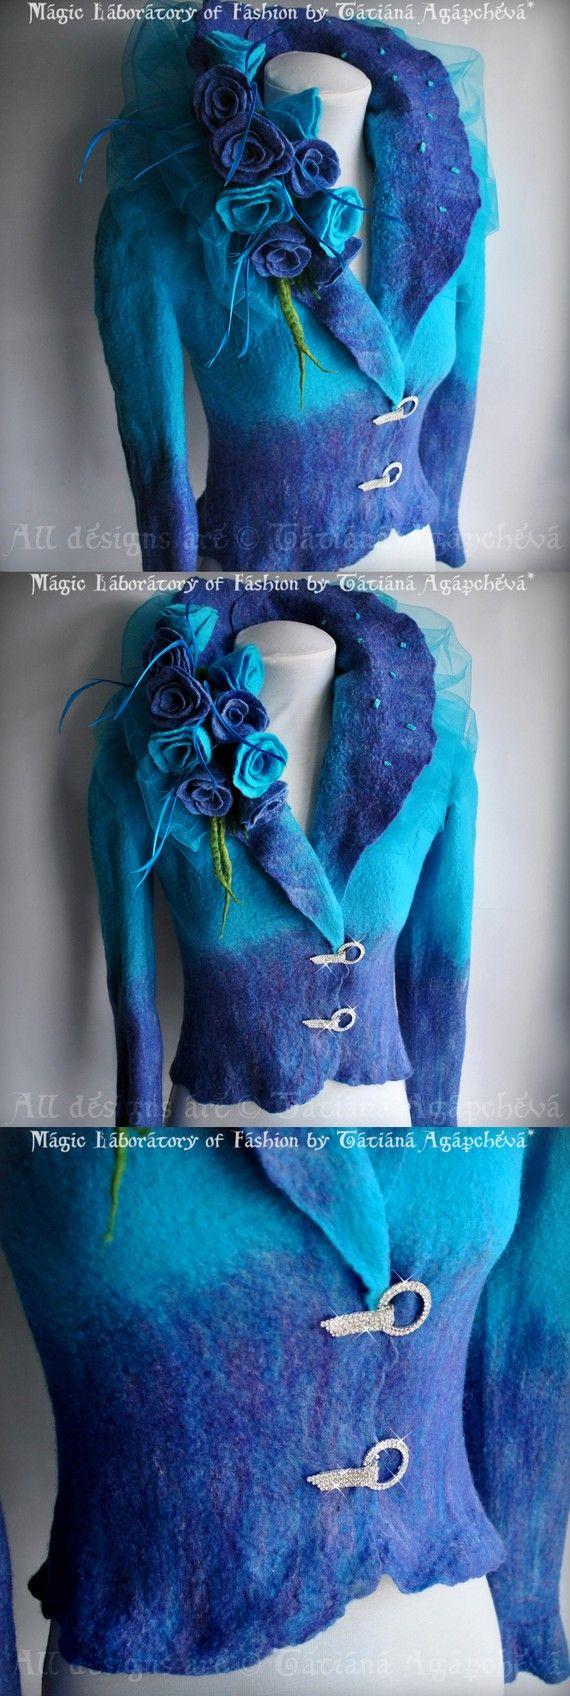 Bluetiful felted jacket w/rhinestones & flowers byTatiana Agapcheva (Ufa, Moscow, New York, Paris, Los Angeles)